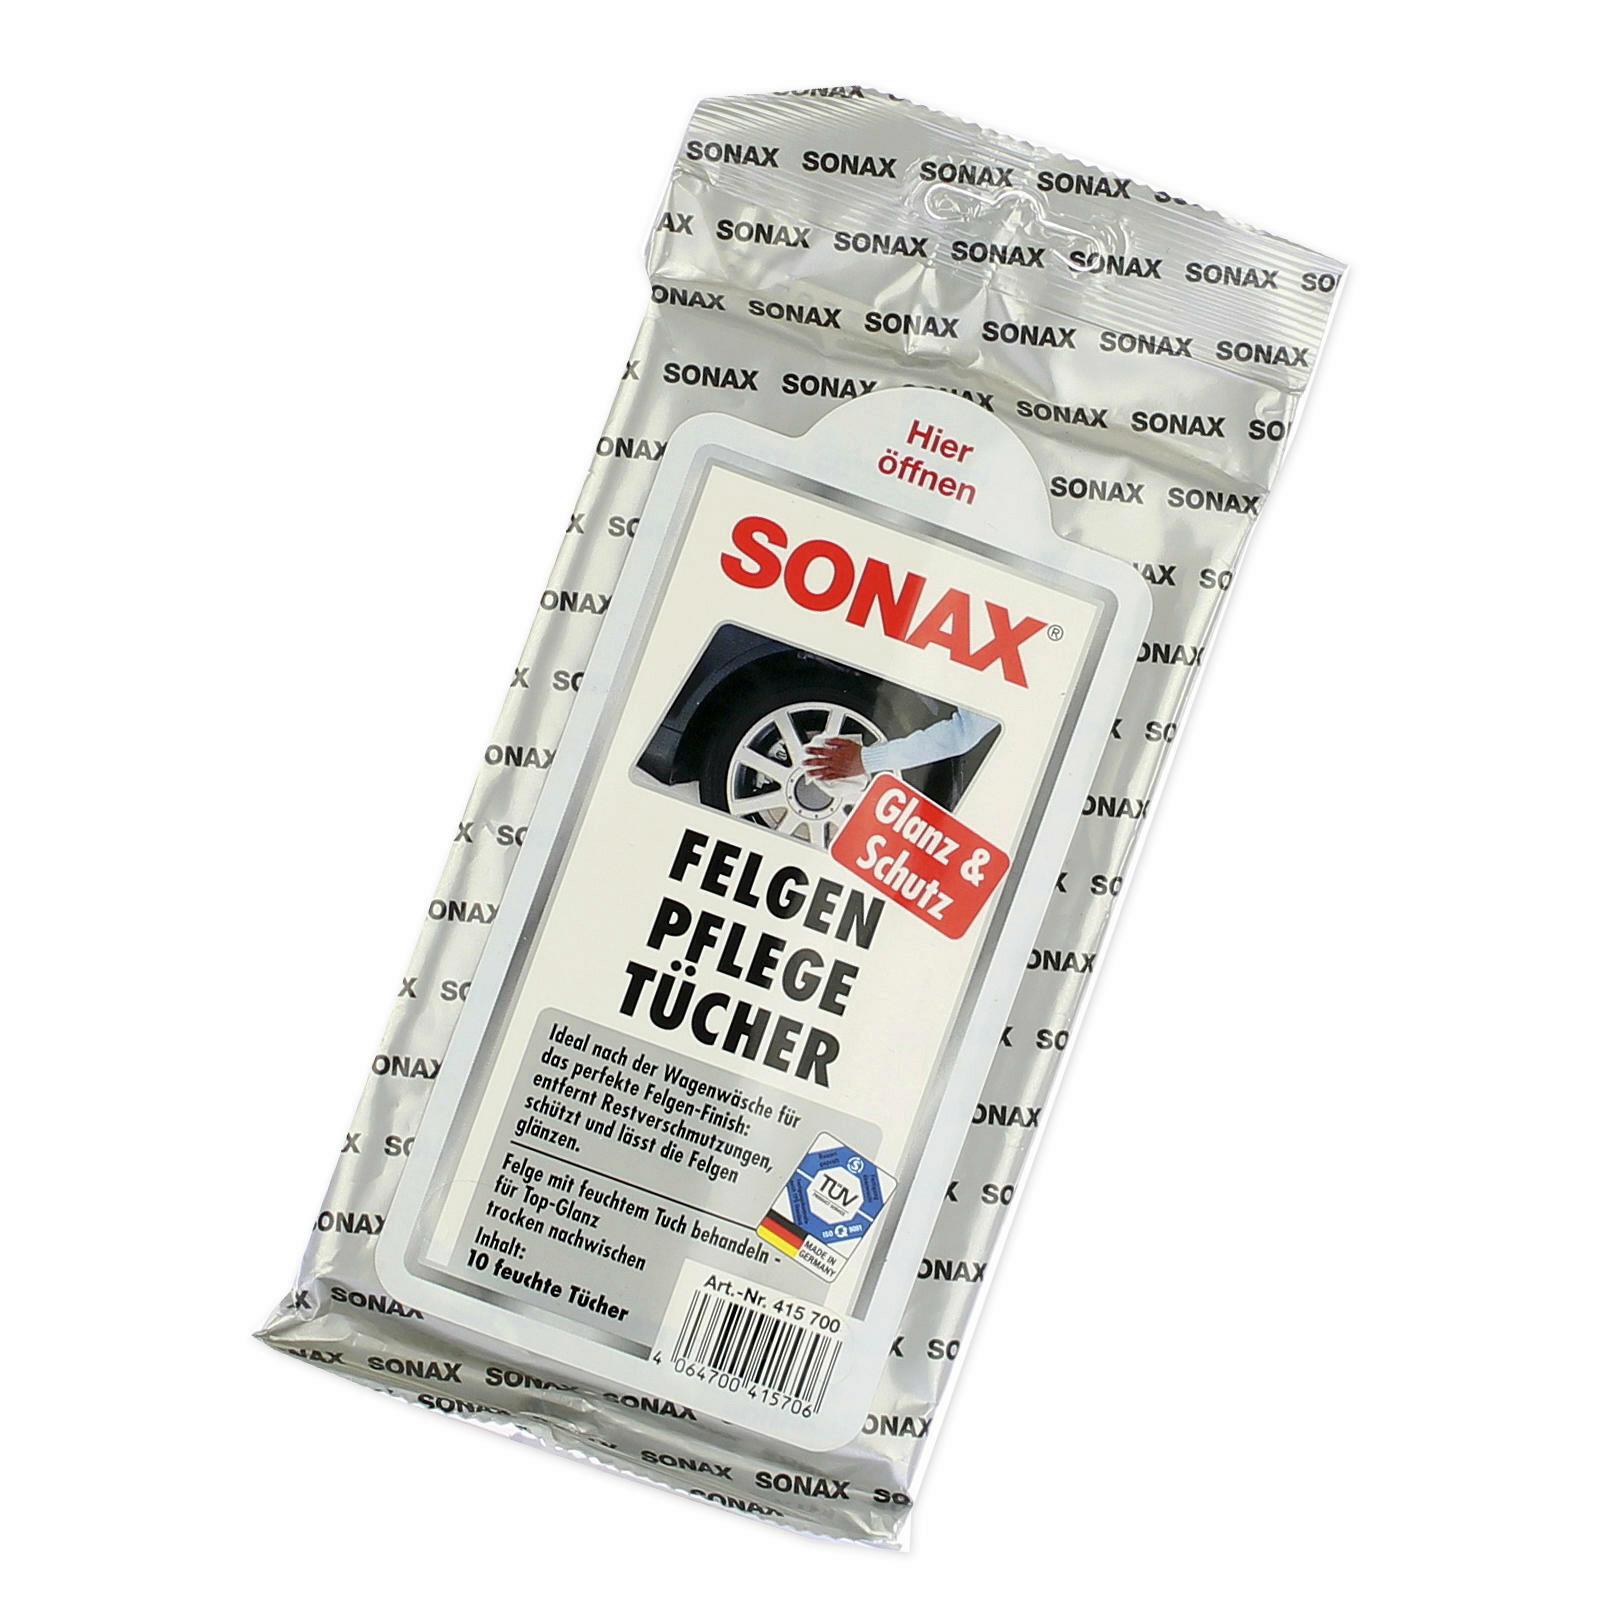 SONAX FelgenPflegeTücher